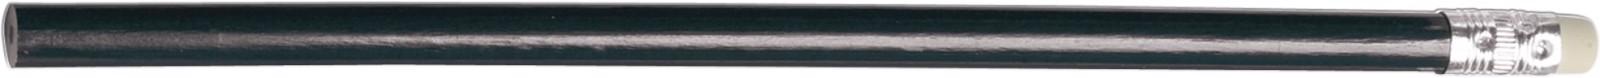 Wooden pencil - Black